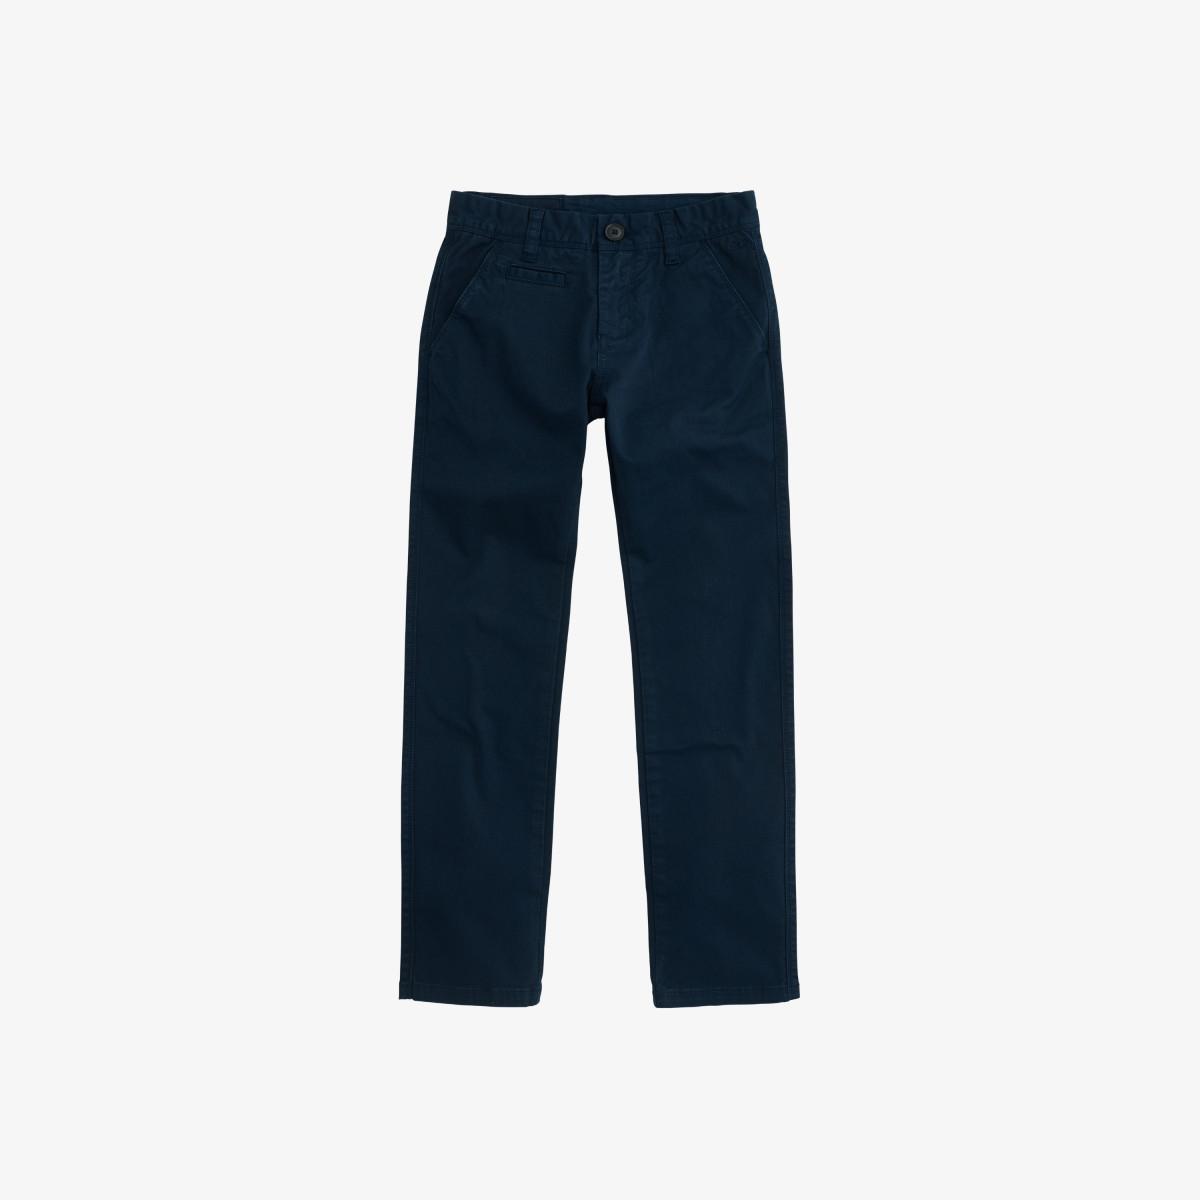 BOY'S PANT CHINO SLIM NAVY BLUE